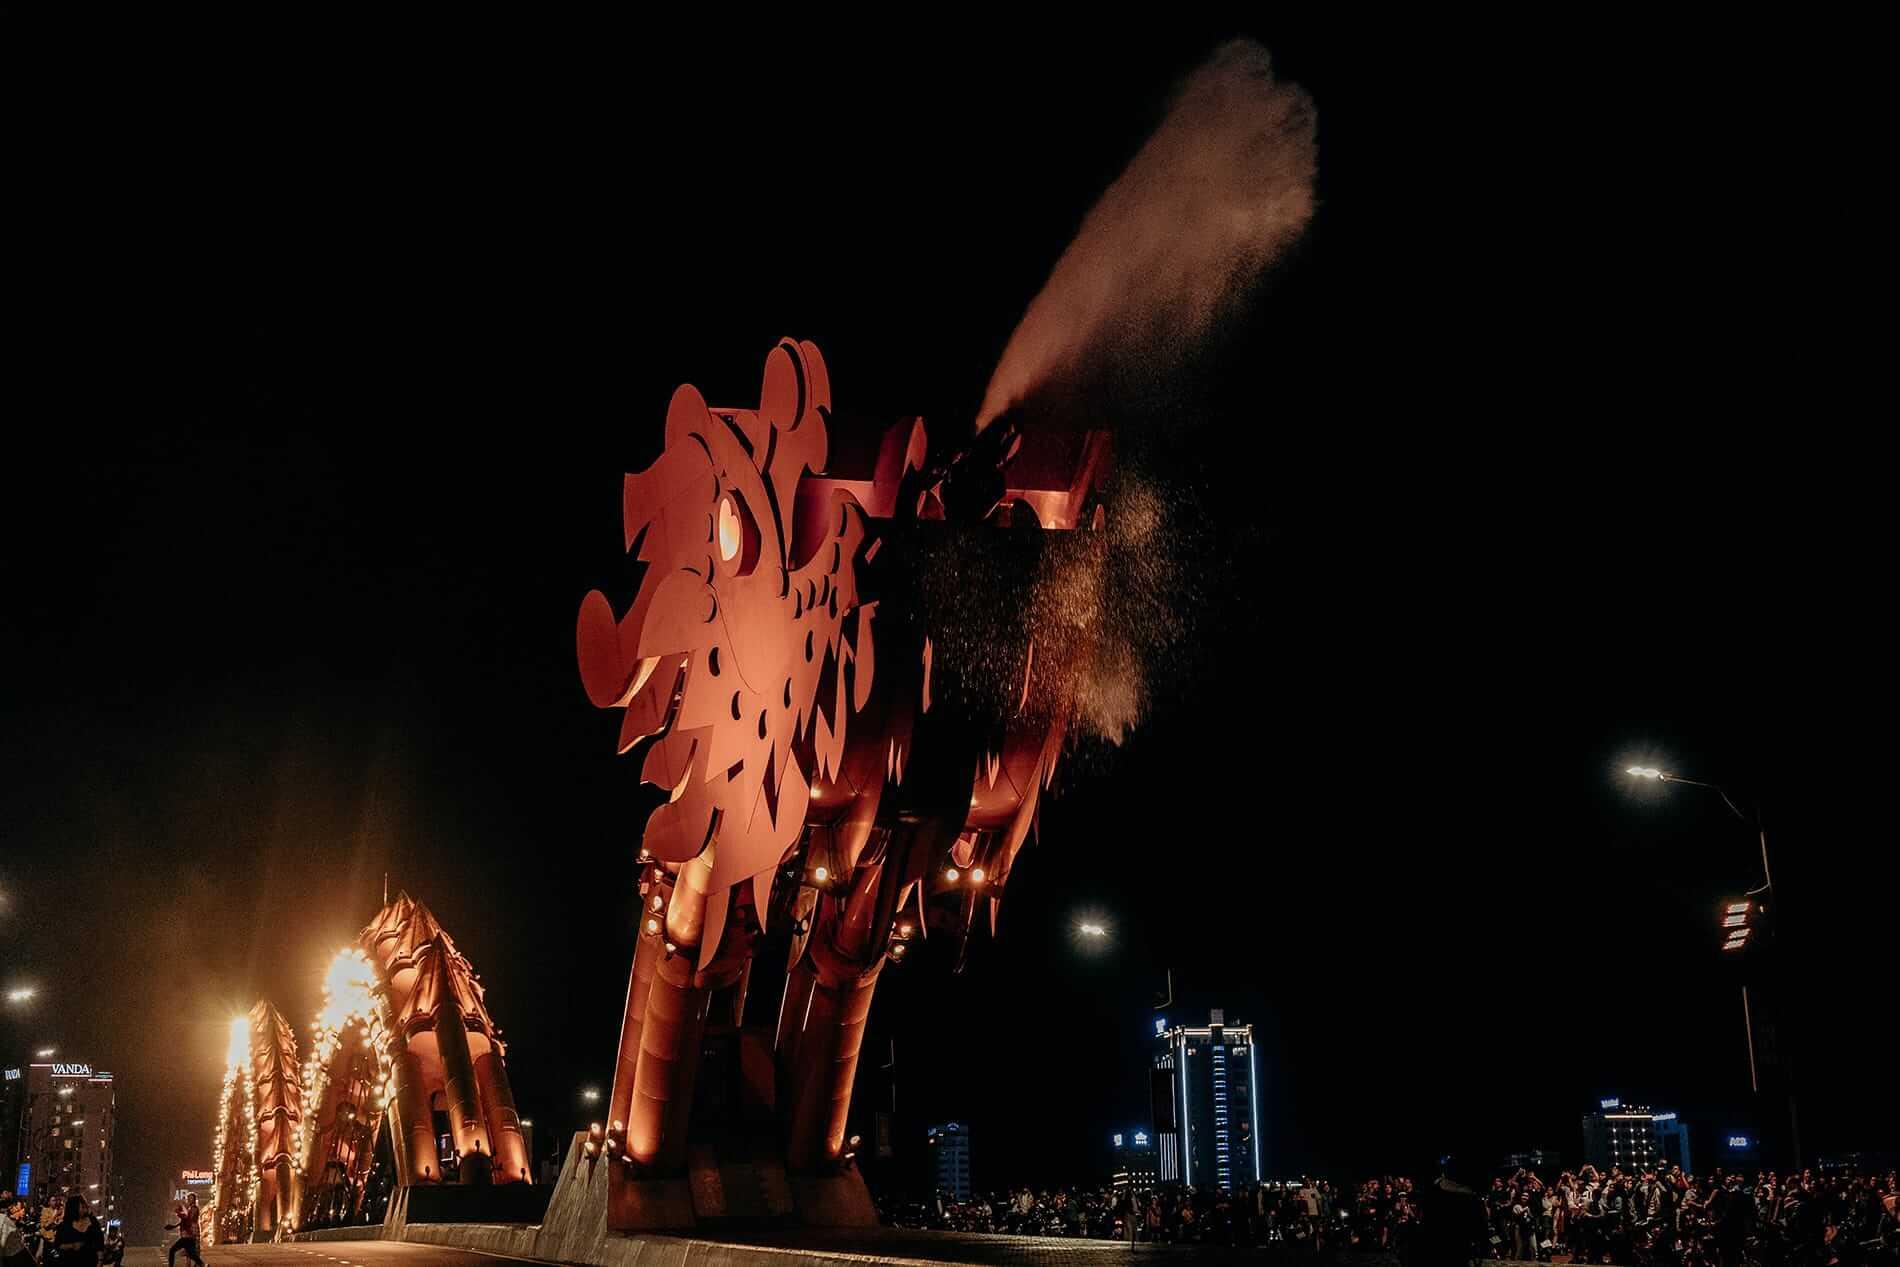 The Dragon Bridge erupts water at night